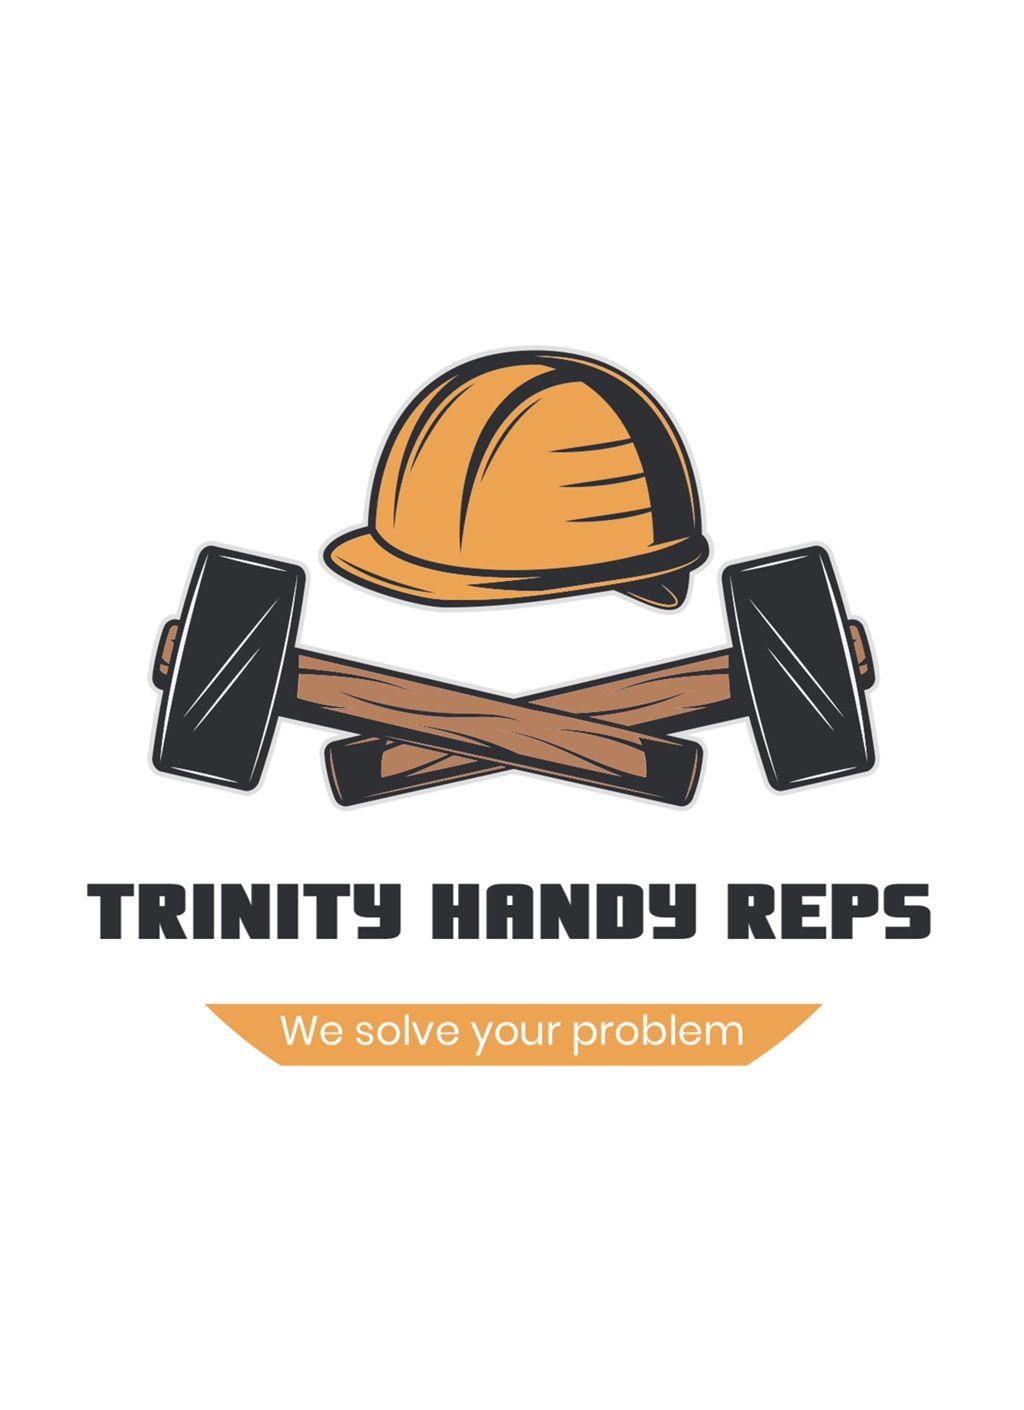 Trinity Handy Reps